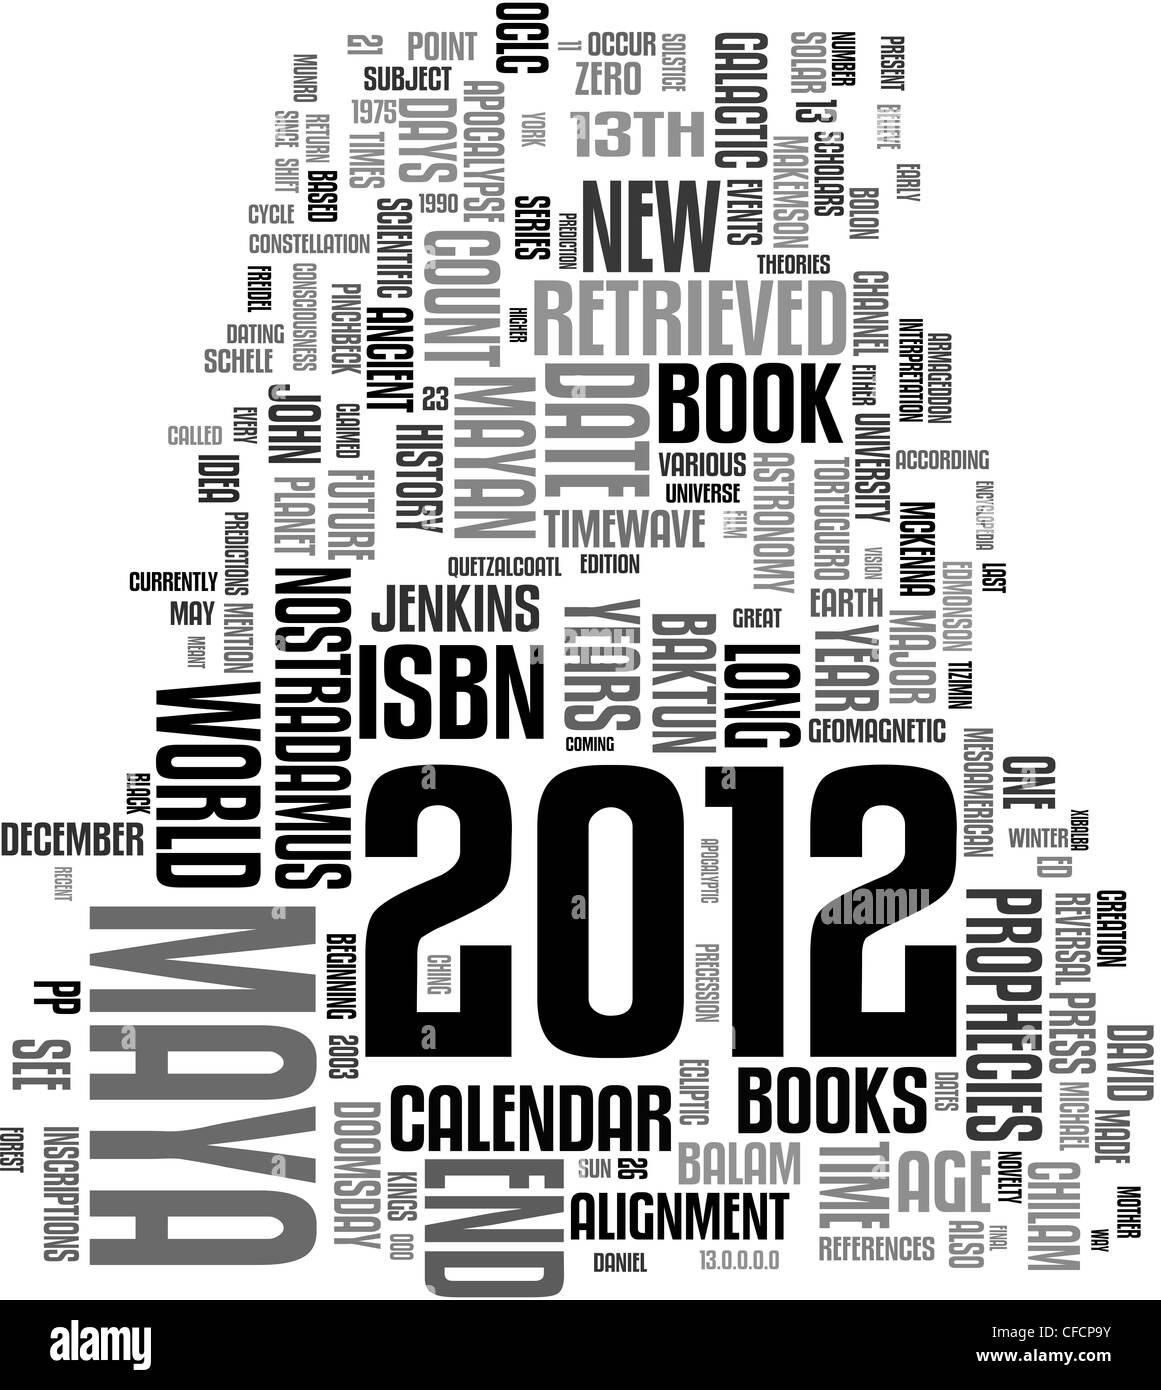 2012 Maya calendar word cloud - Stock Image